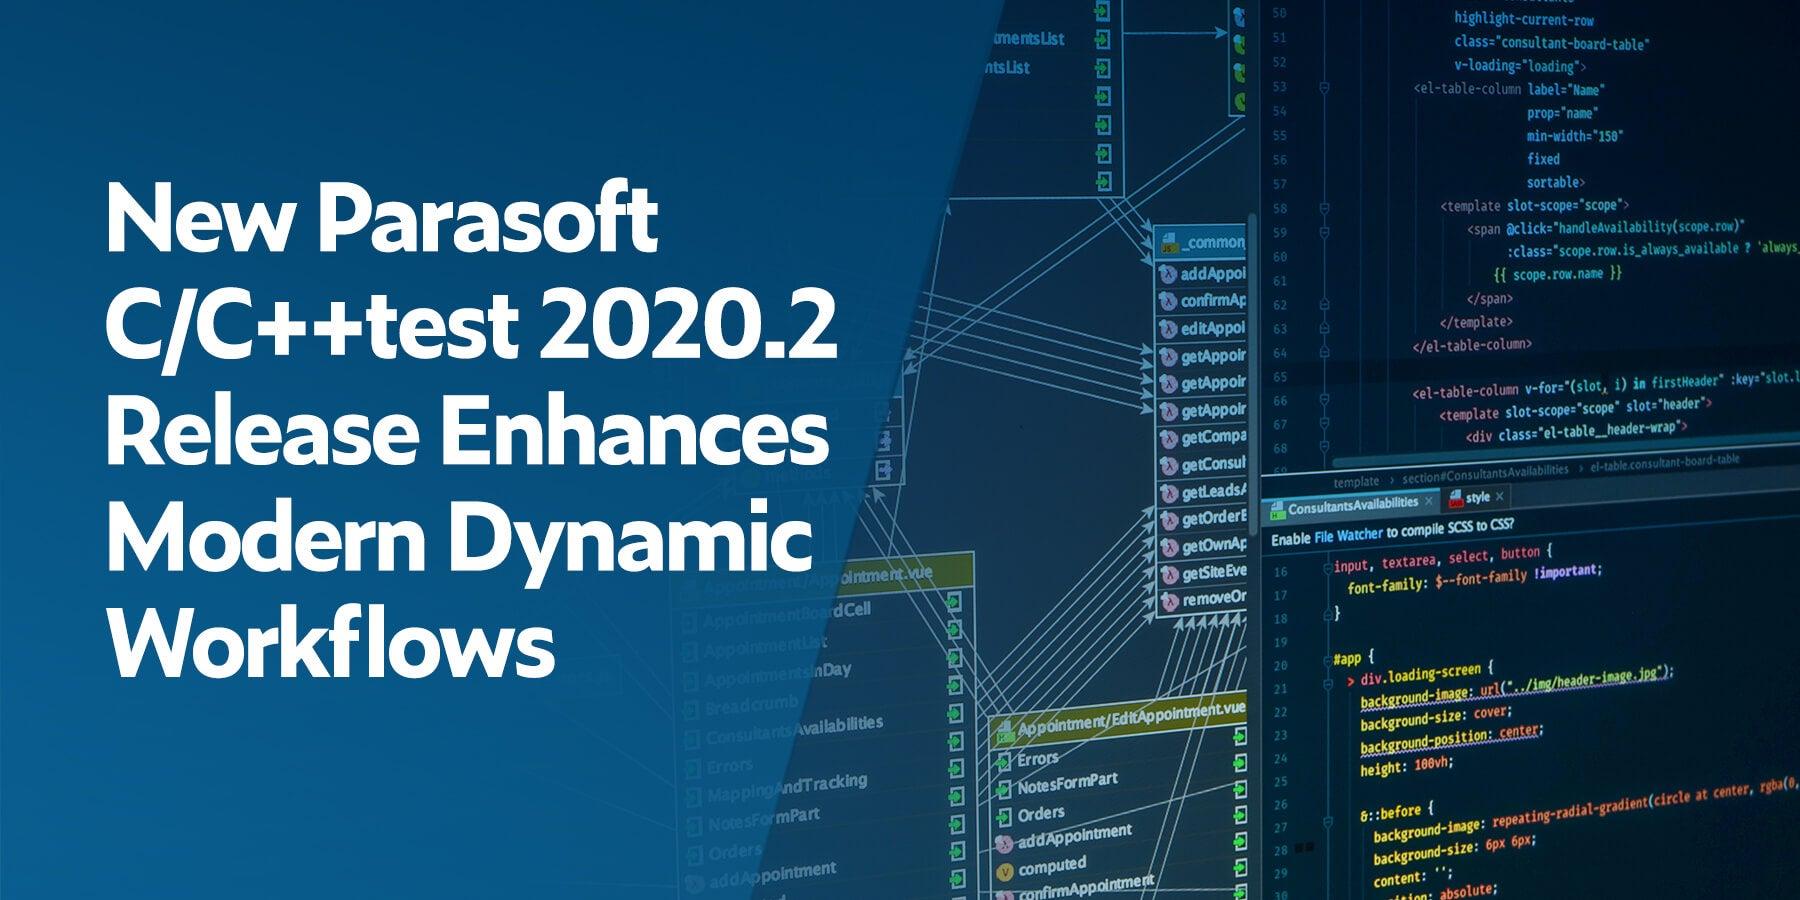 New Parasoft C/C++test 2020.2 Release Enhances Modern Dynamic Workflows